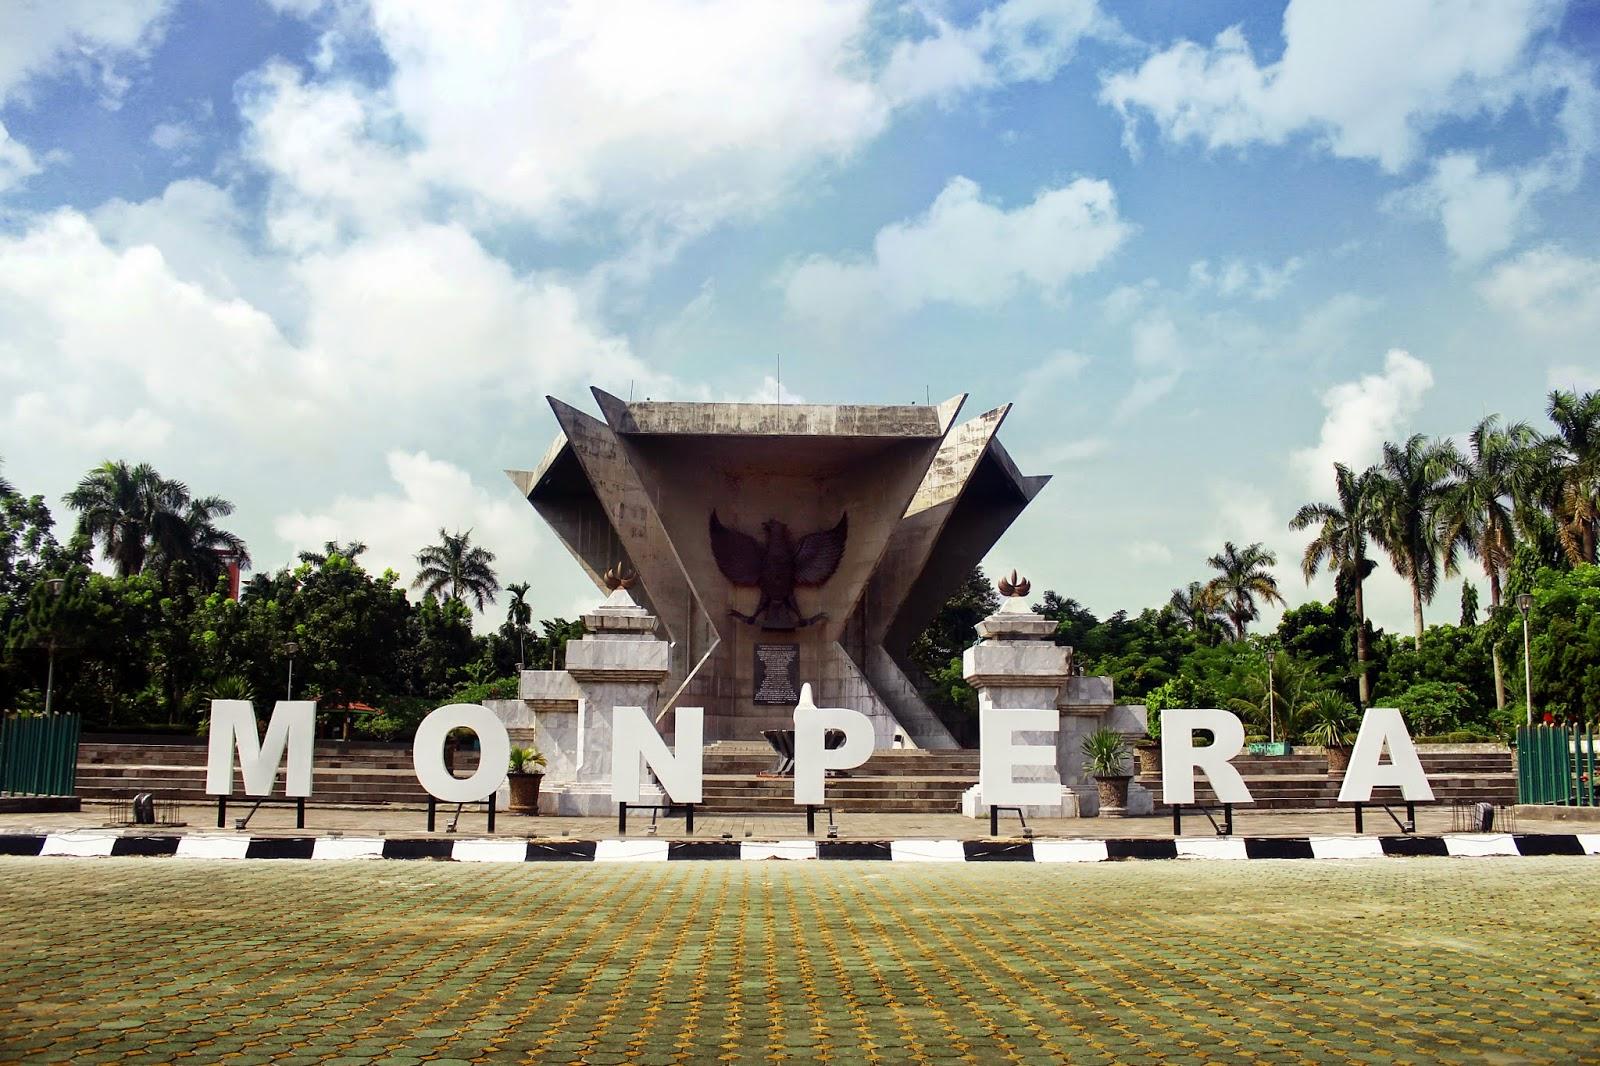 Sharing Info Daftar Objek Wisata Palembang Taman Purbakala Bukit Siguntang